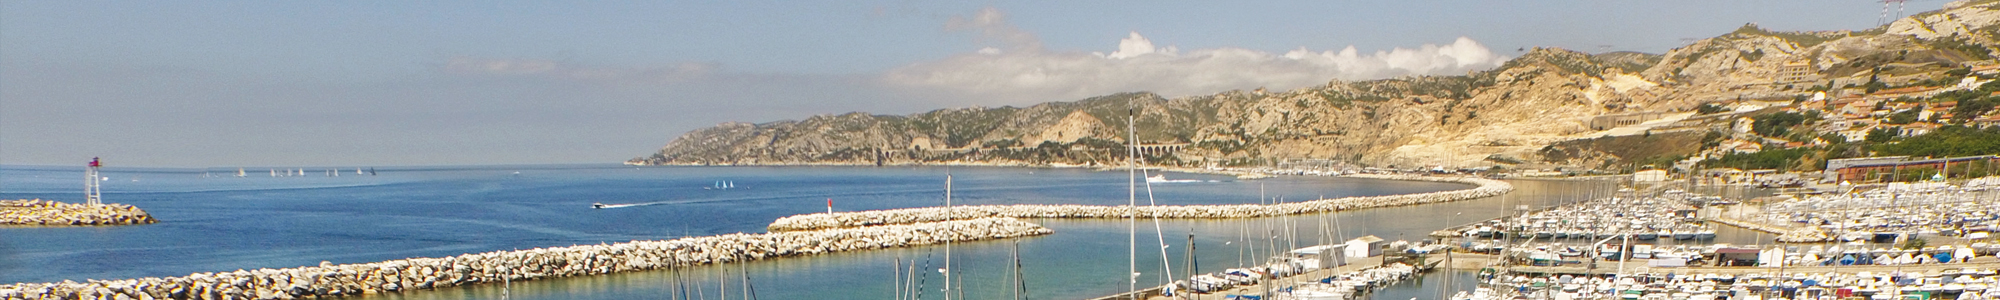 Marseille Bor de Mer vue du port de l'Estaque vers la Côte Bleue